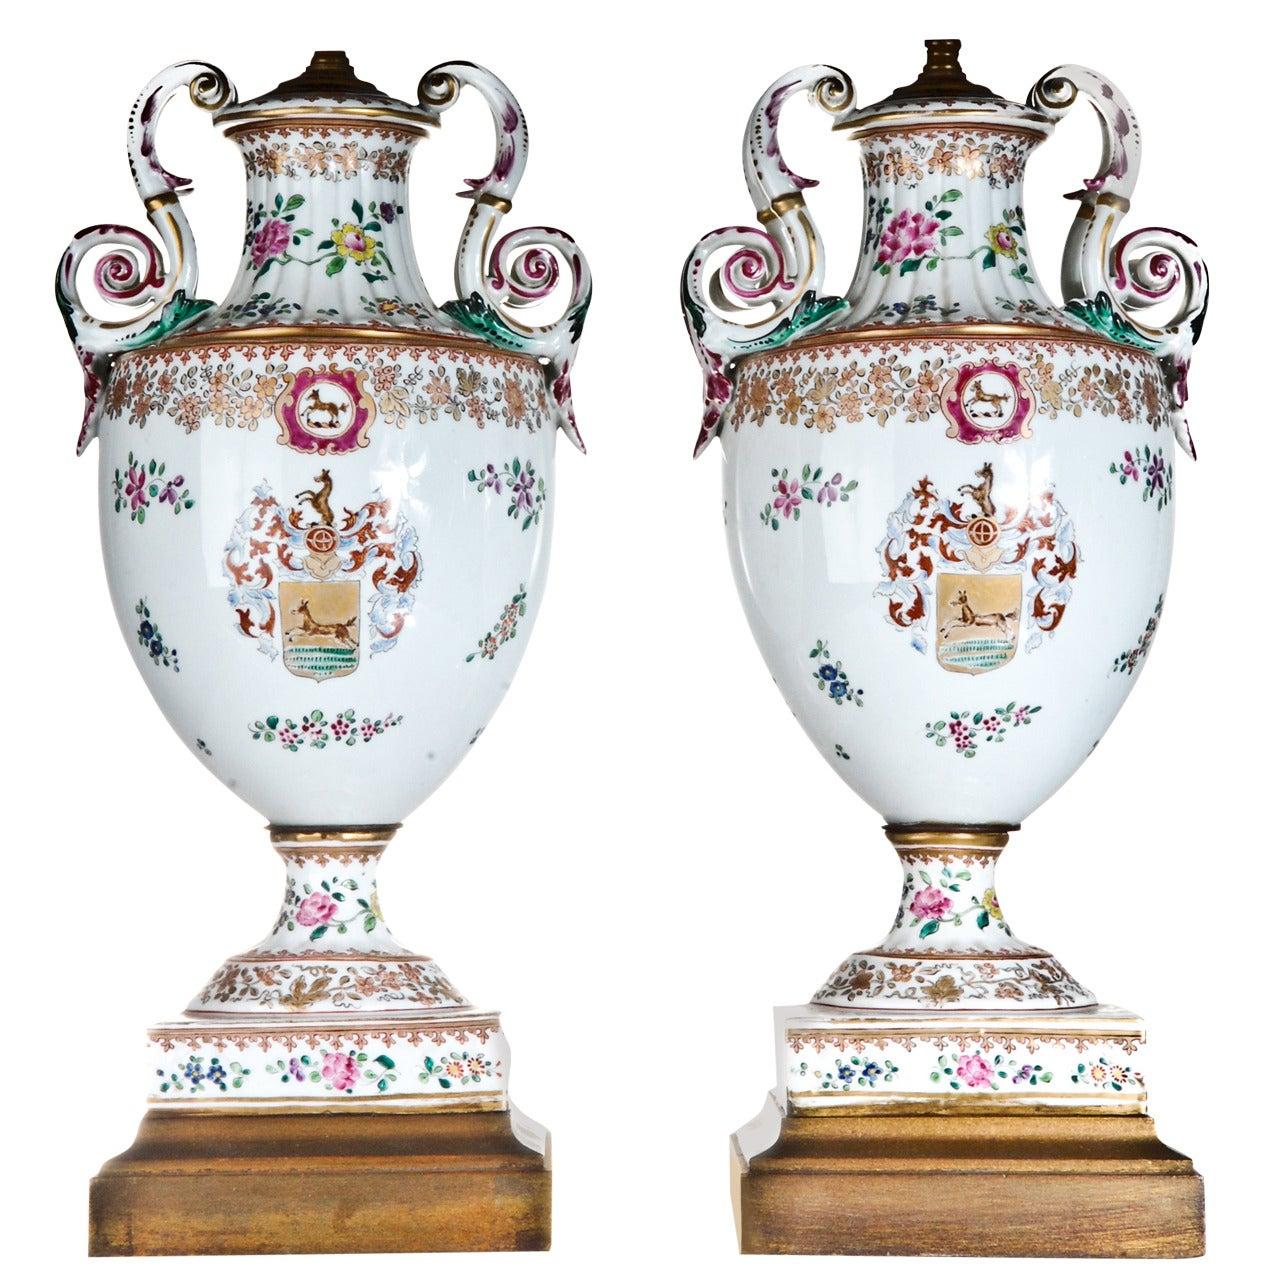 Pair of Antique French Louis XVI Style Porcelain Vases